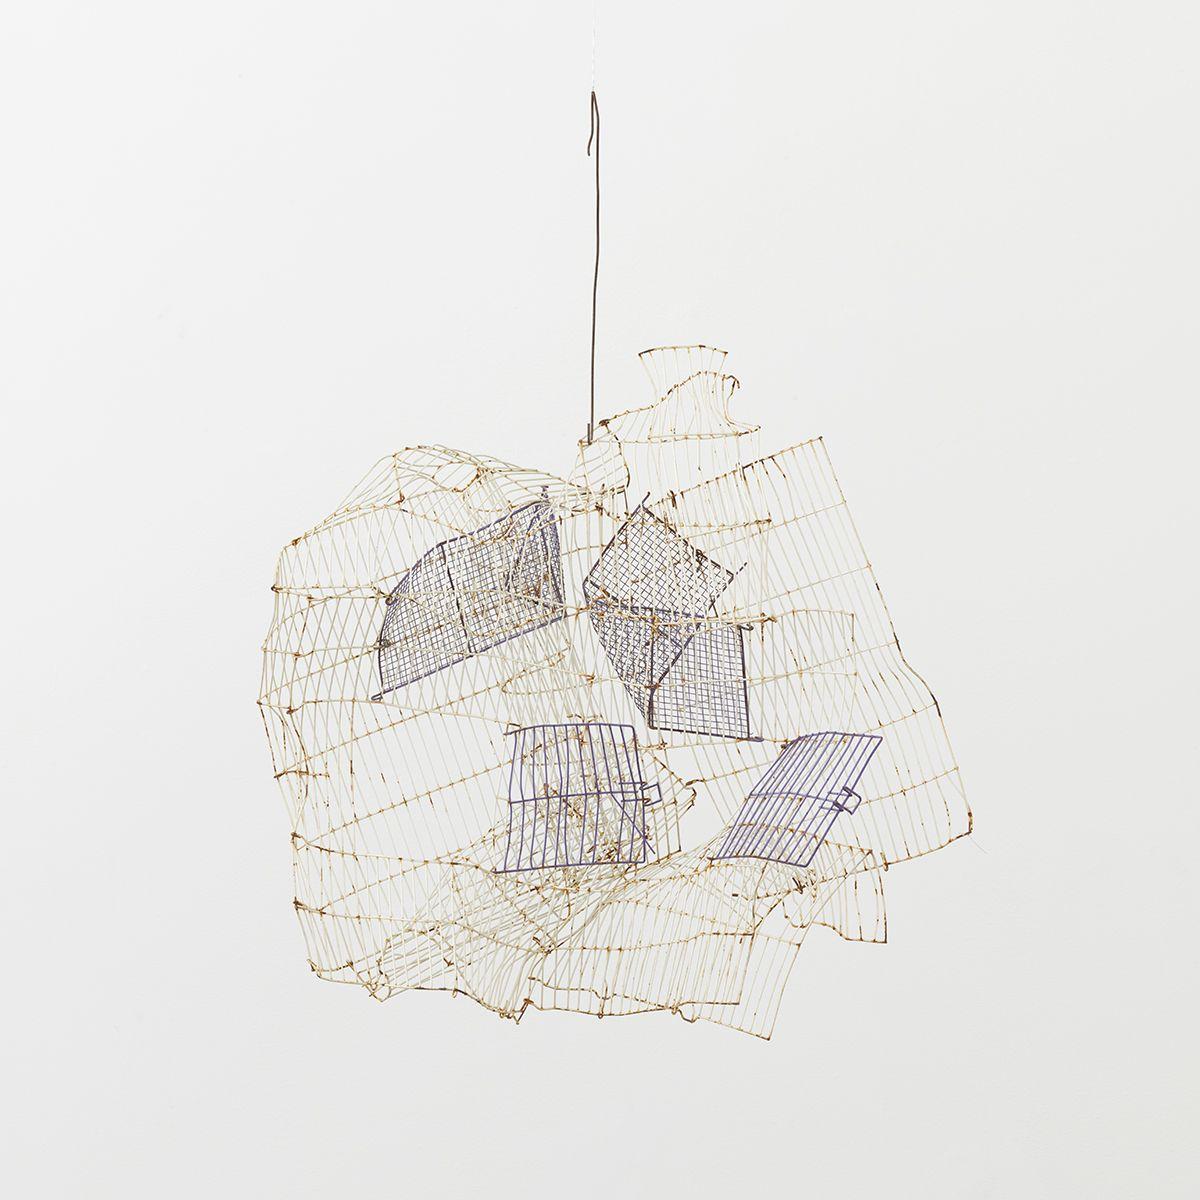 Gedi Sibony, The Shivered, 2015